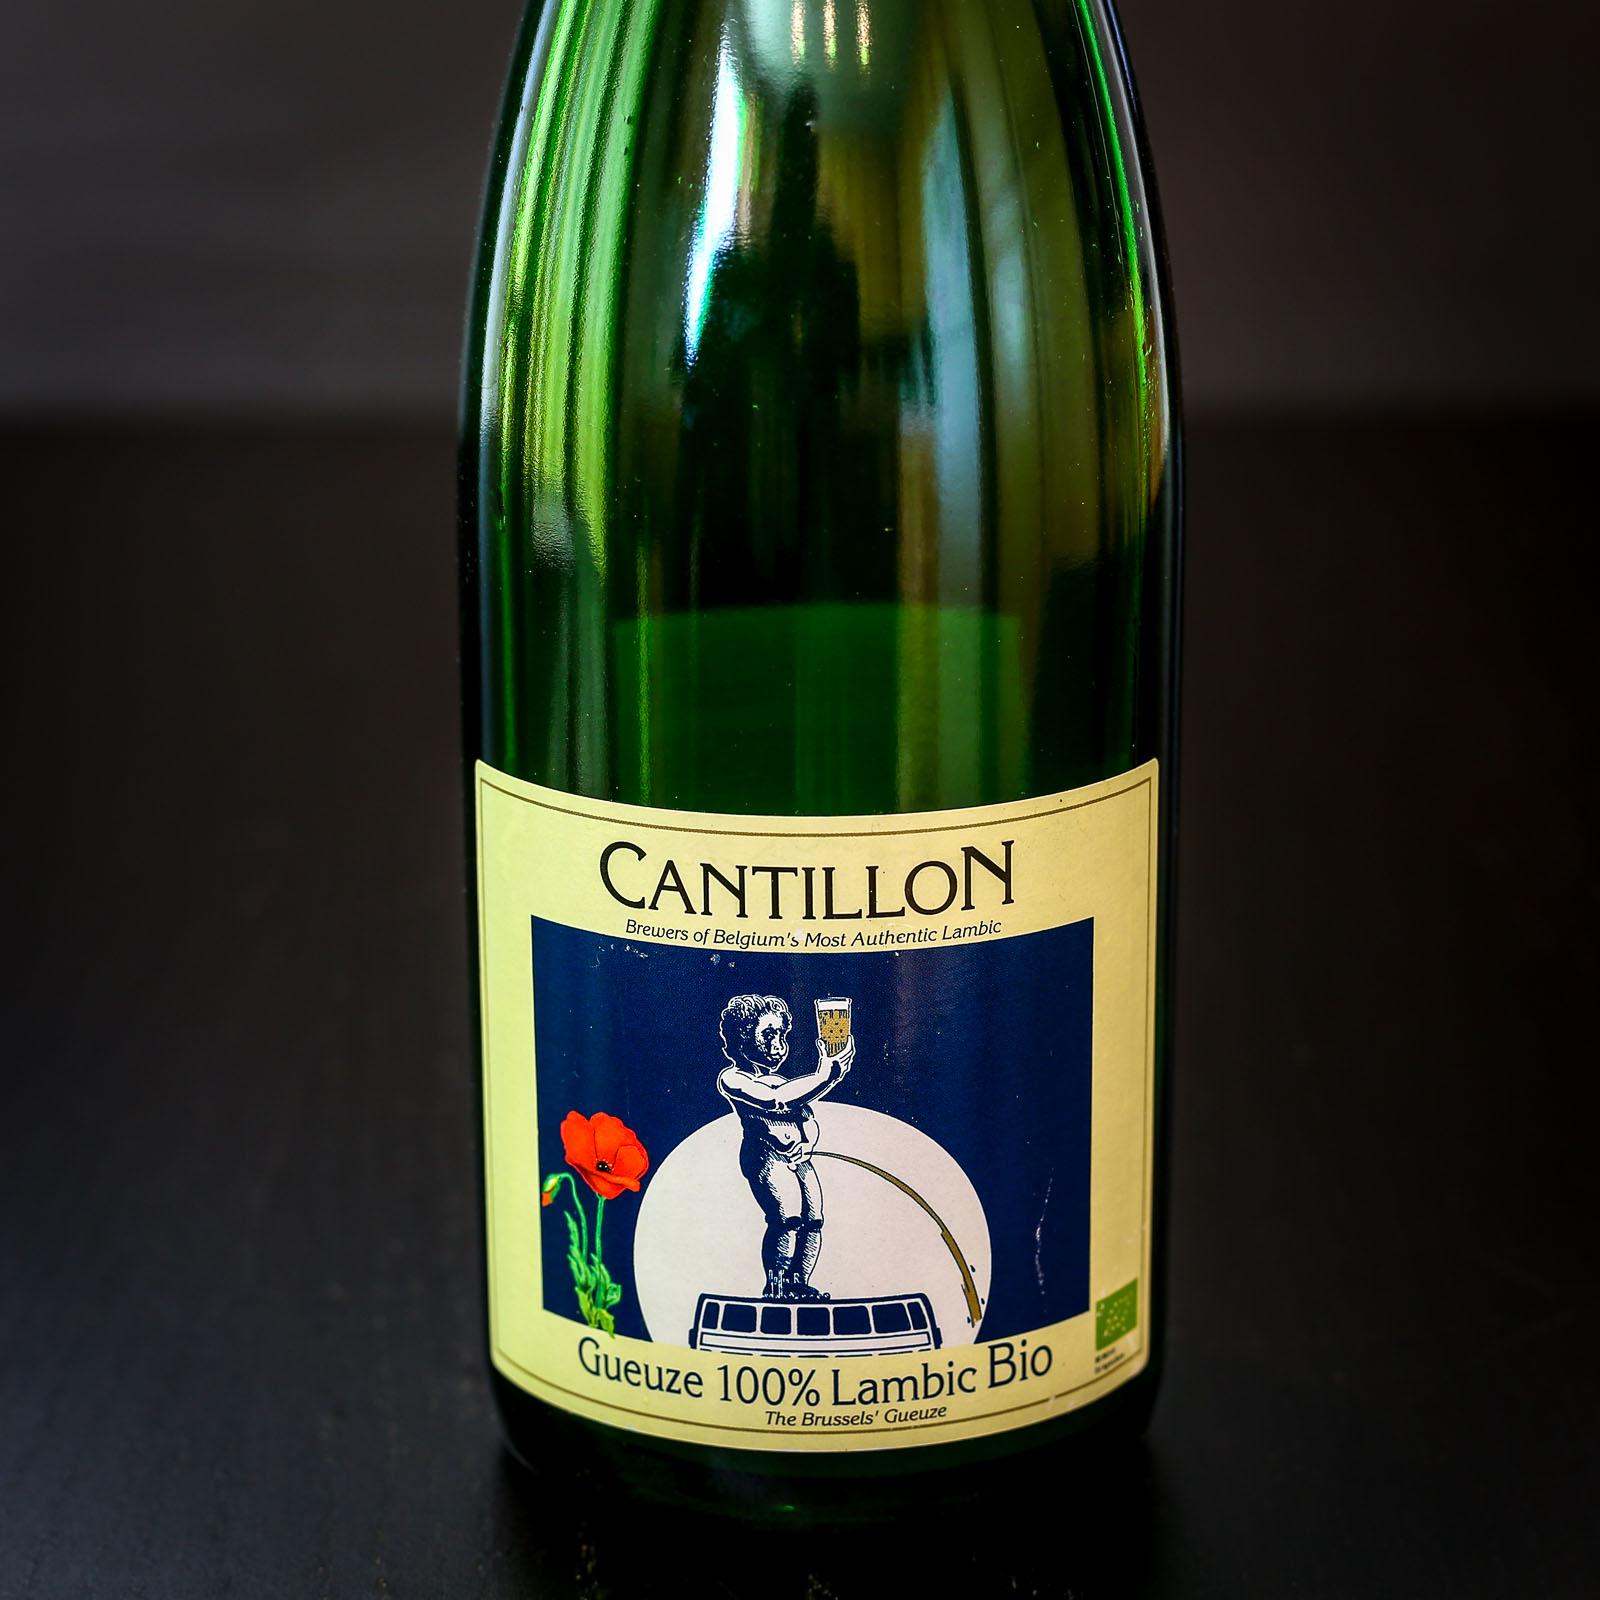 Brasserie Cantillon - Gueuze 100% Lambic Bio